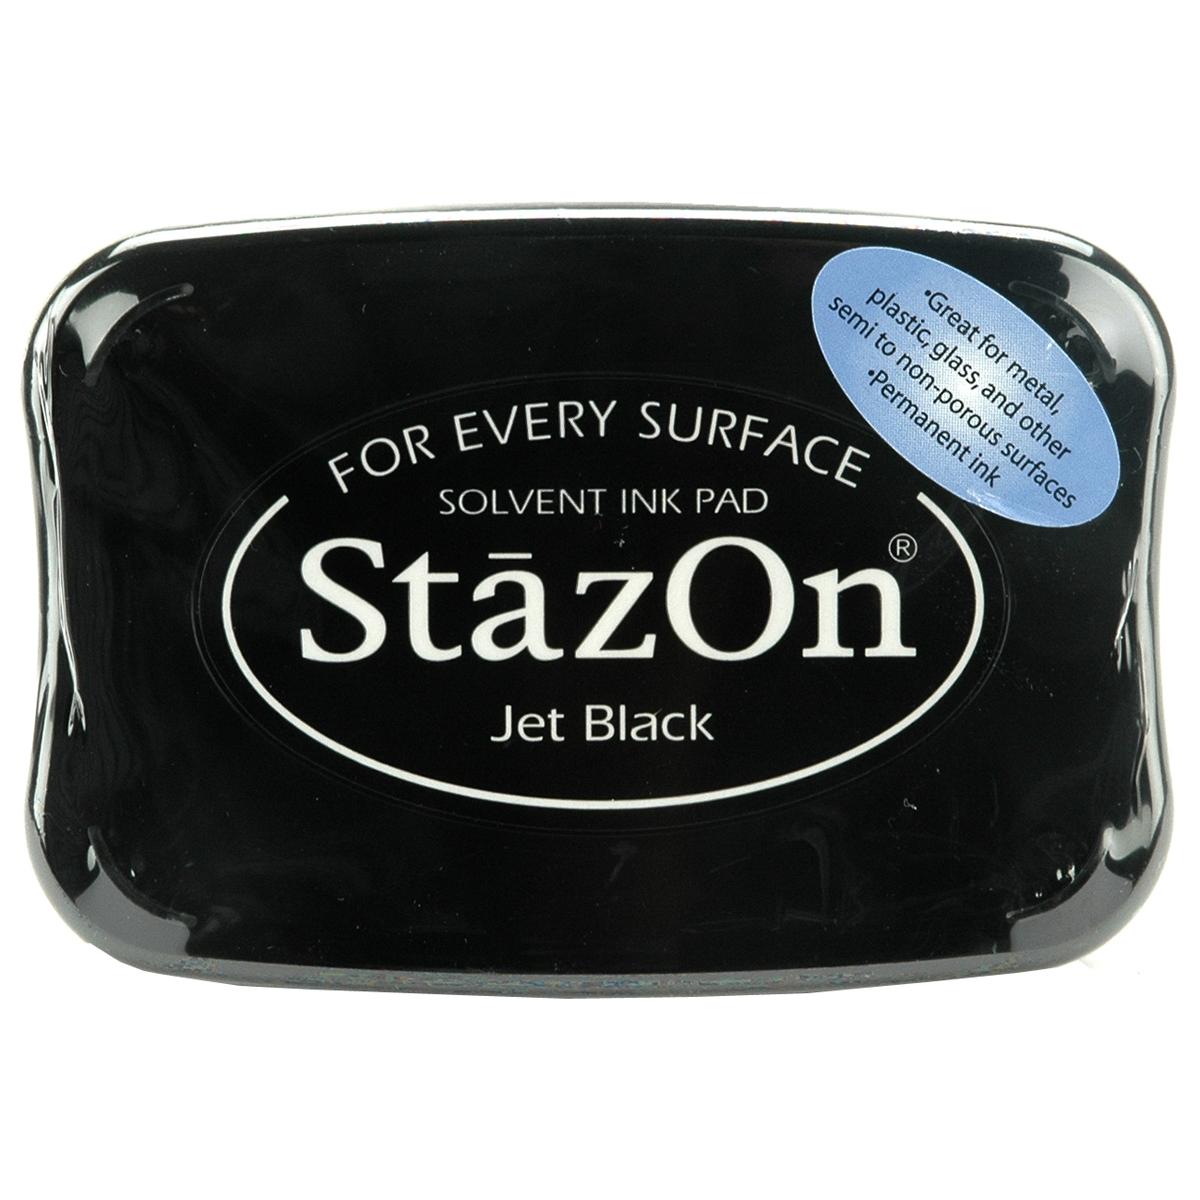 StazOn Solvent Ink Pad-Jet Black